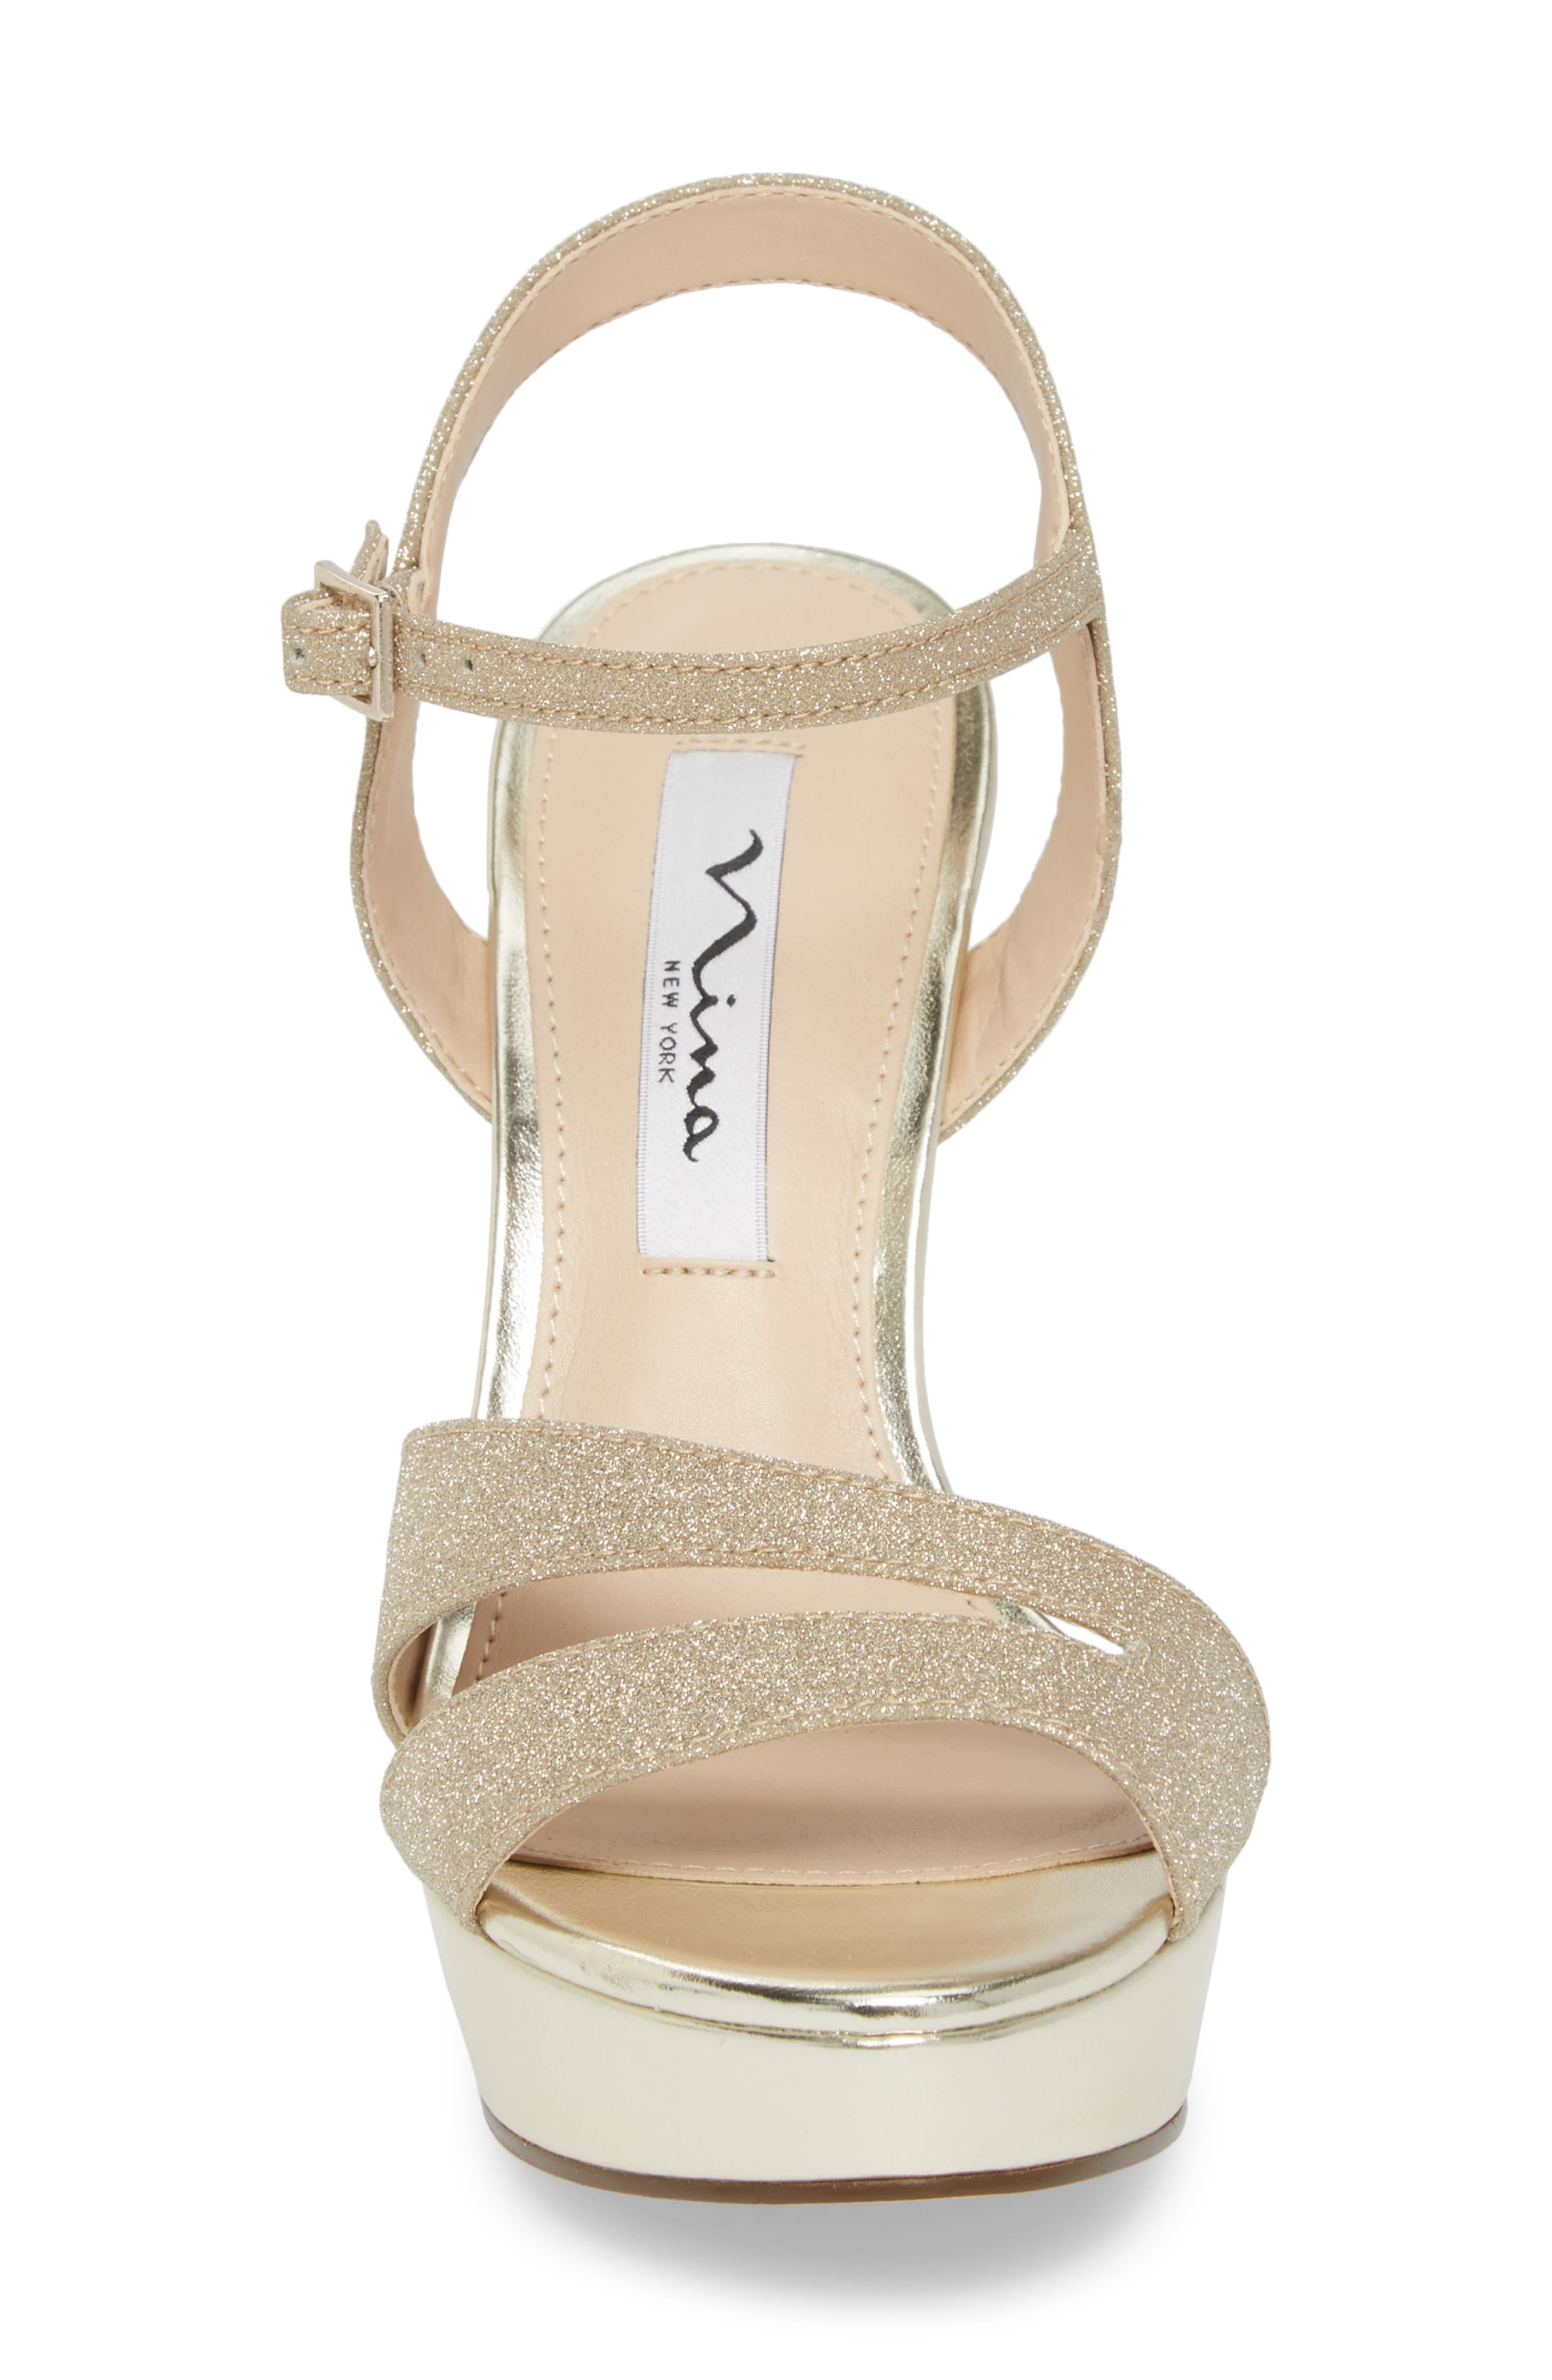 Silana Platform Sandal,                             Alternate thumbnail 4, color,                             Gold Glitter Fabric